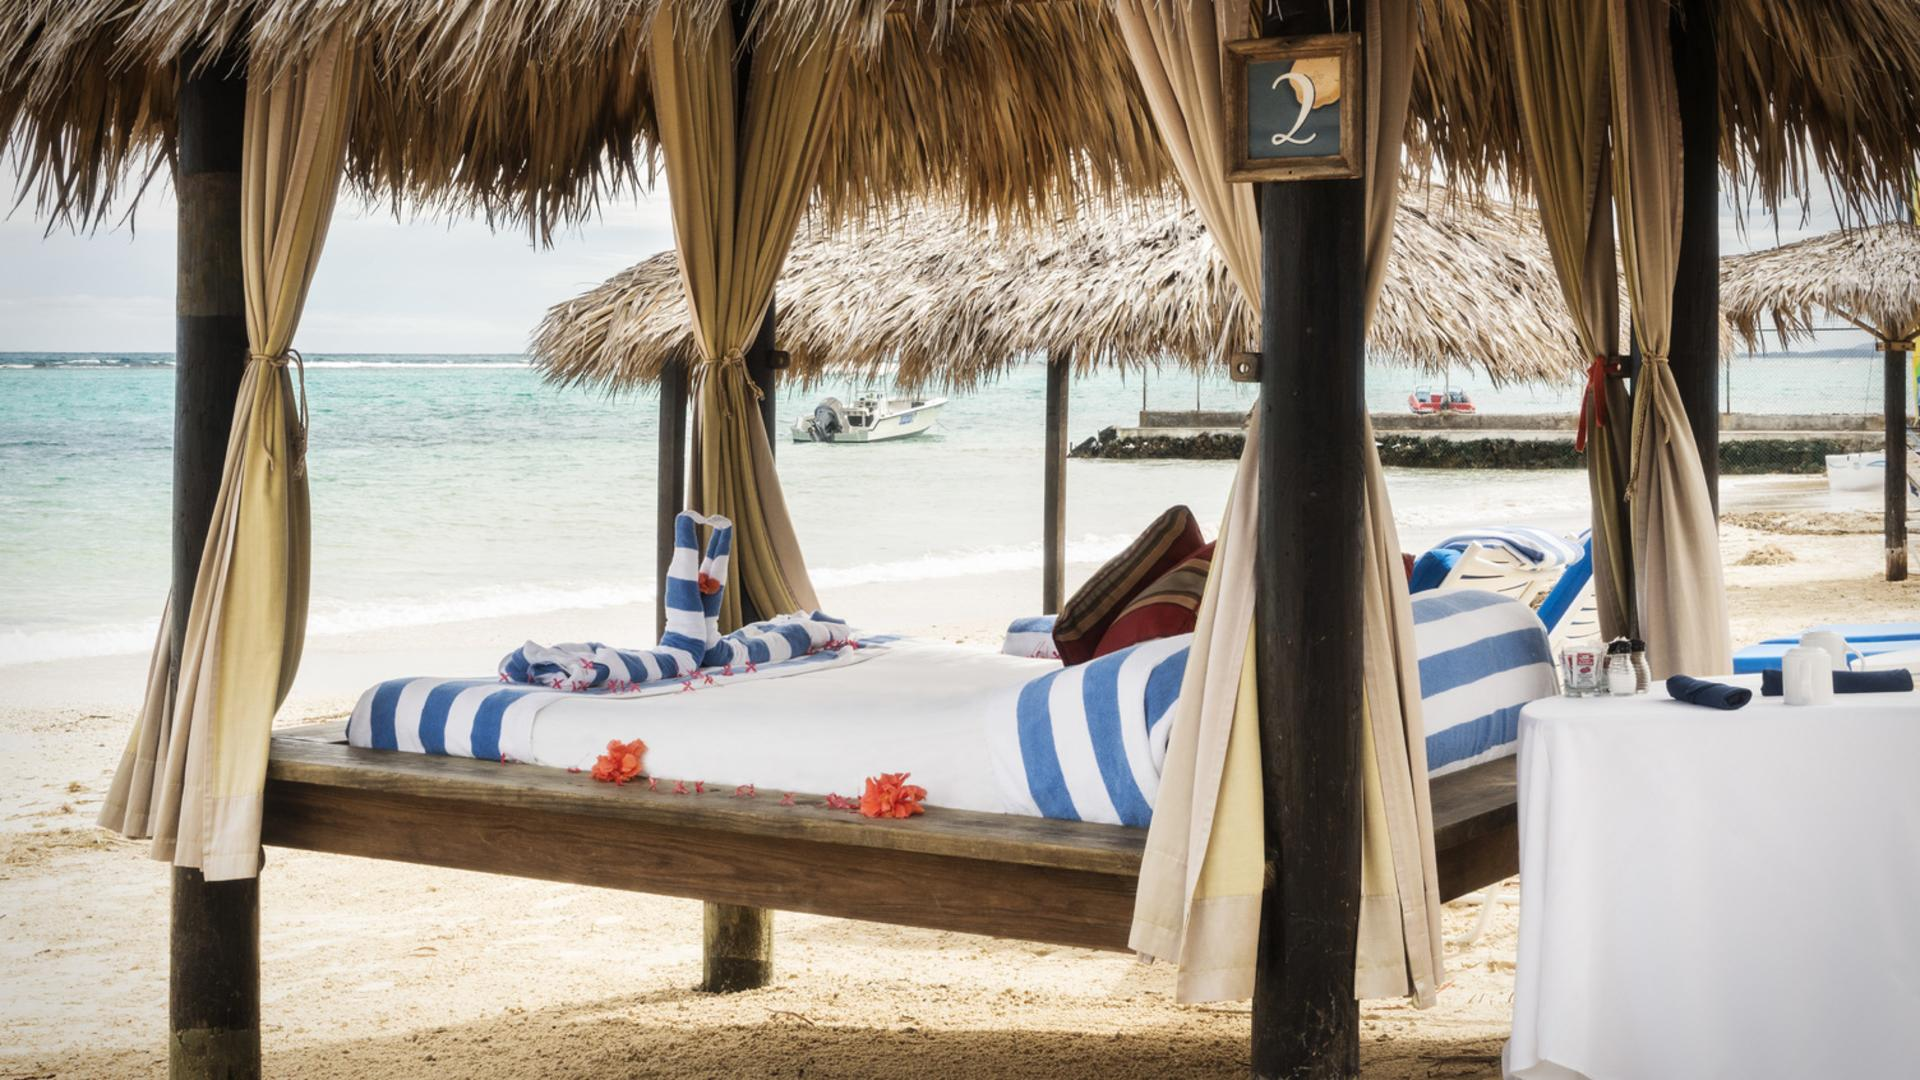 Jewel Dunn's River Beach Cabana